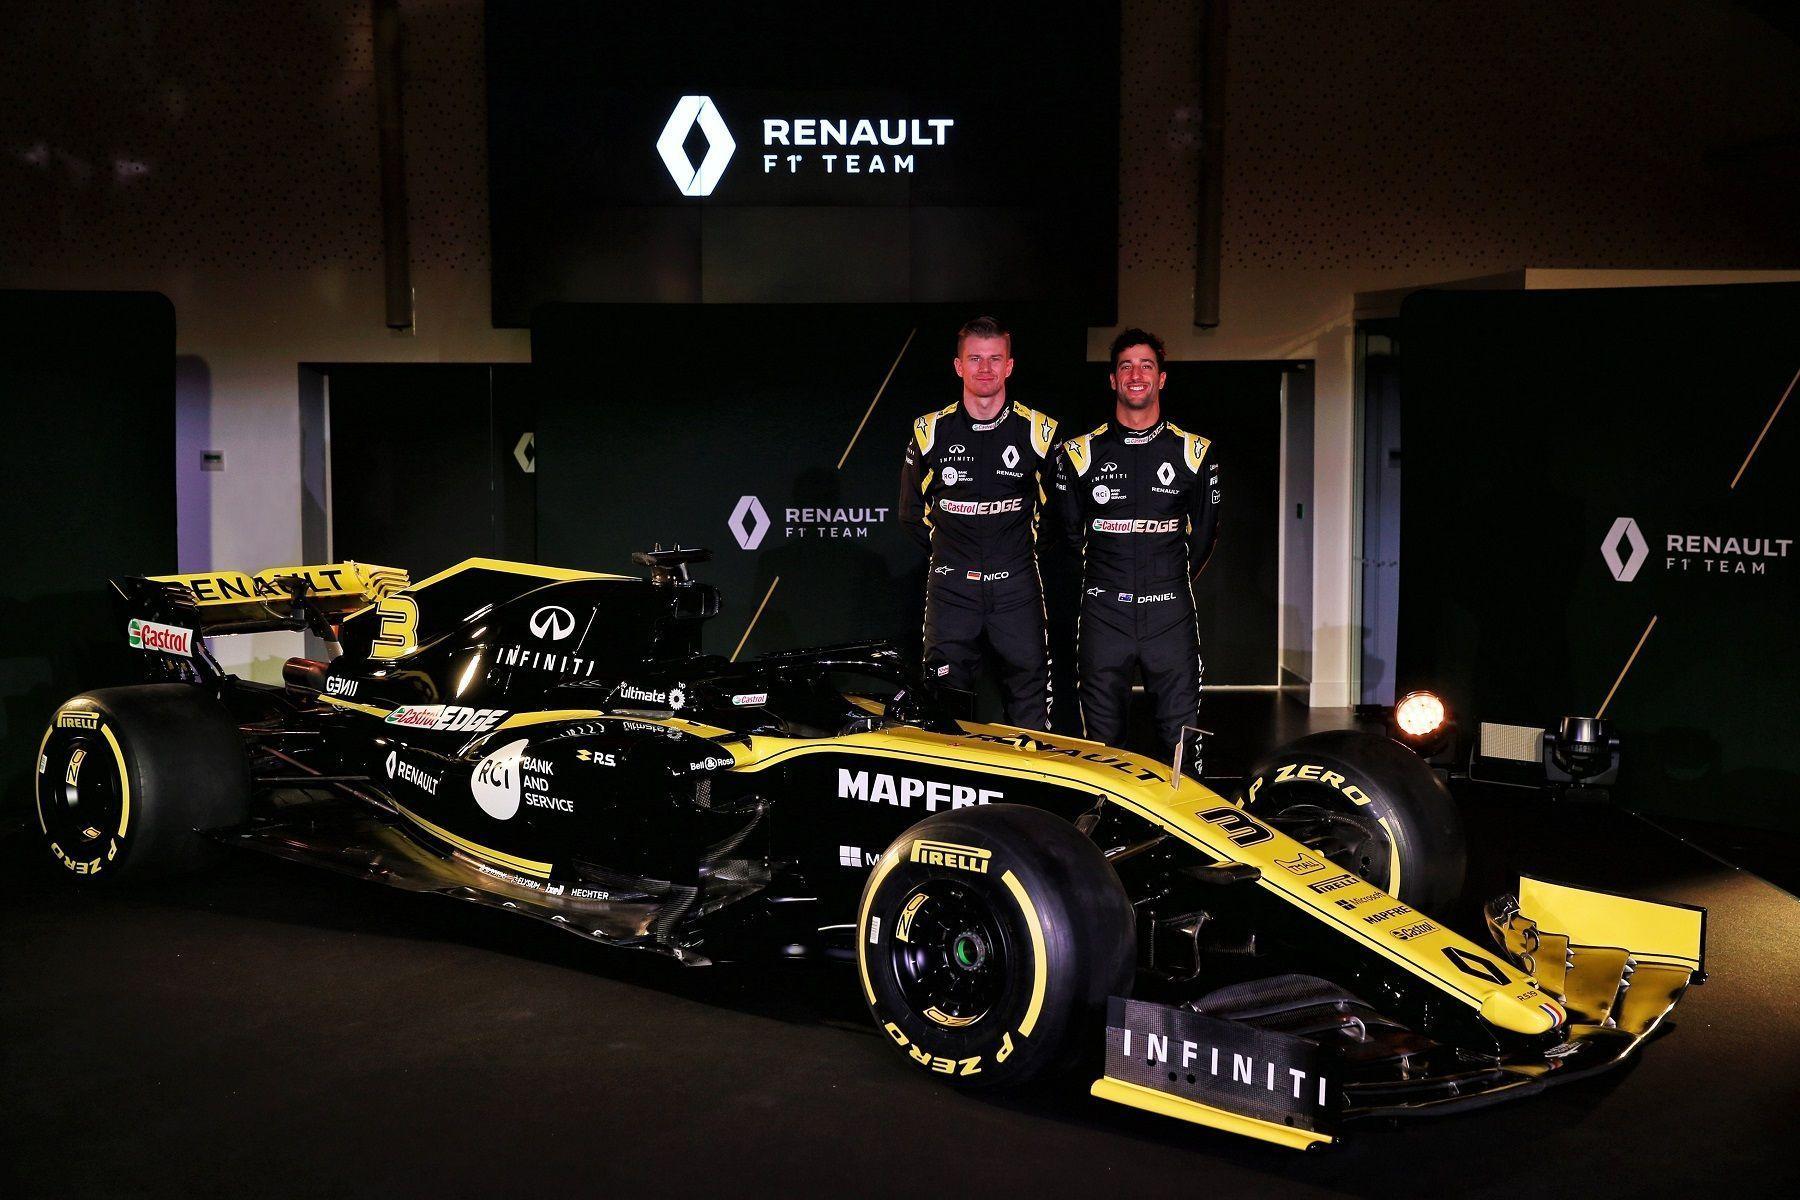 Daniel Ricciardo, Nico Hulkenberg, Renault F1 2019